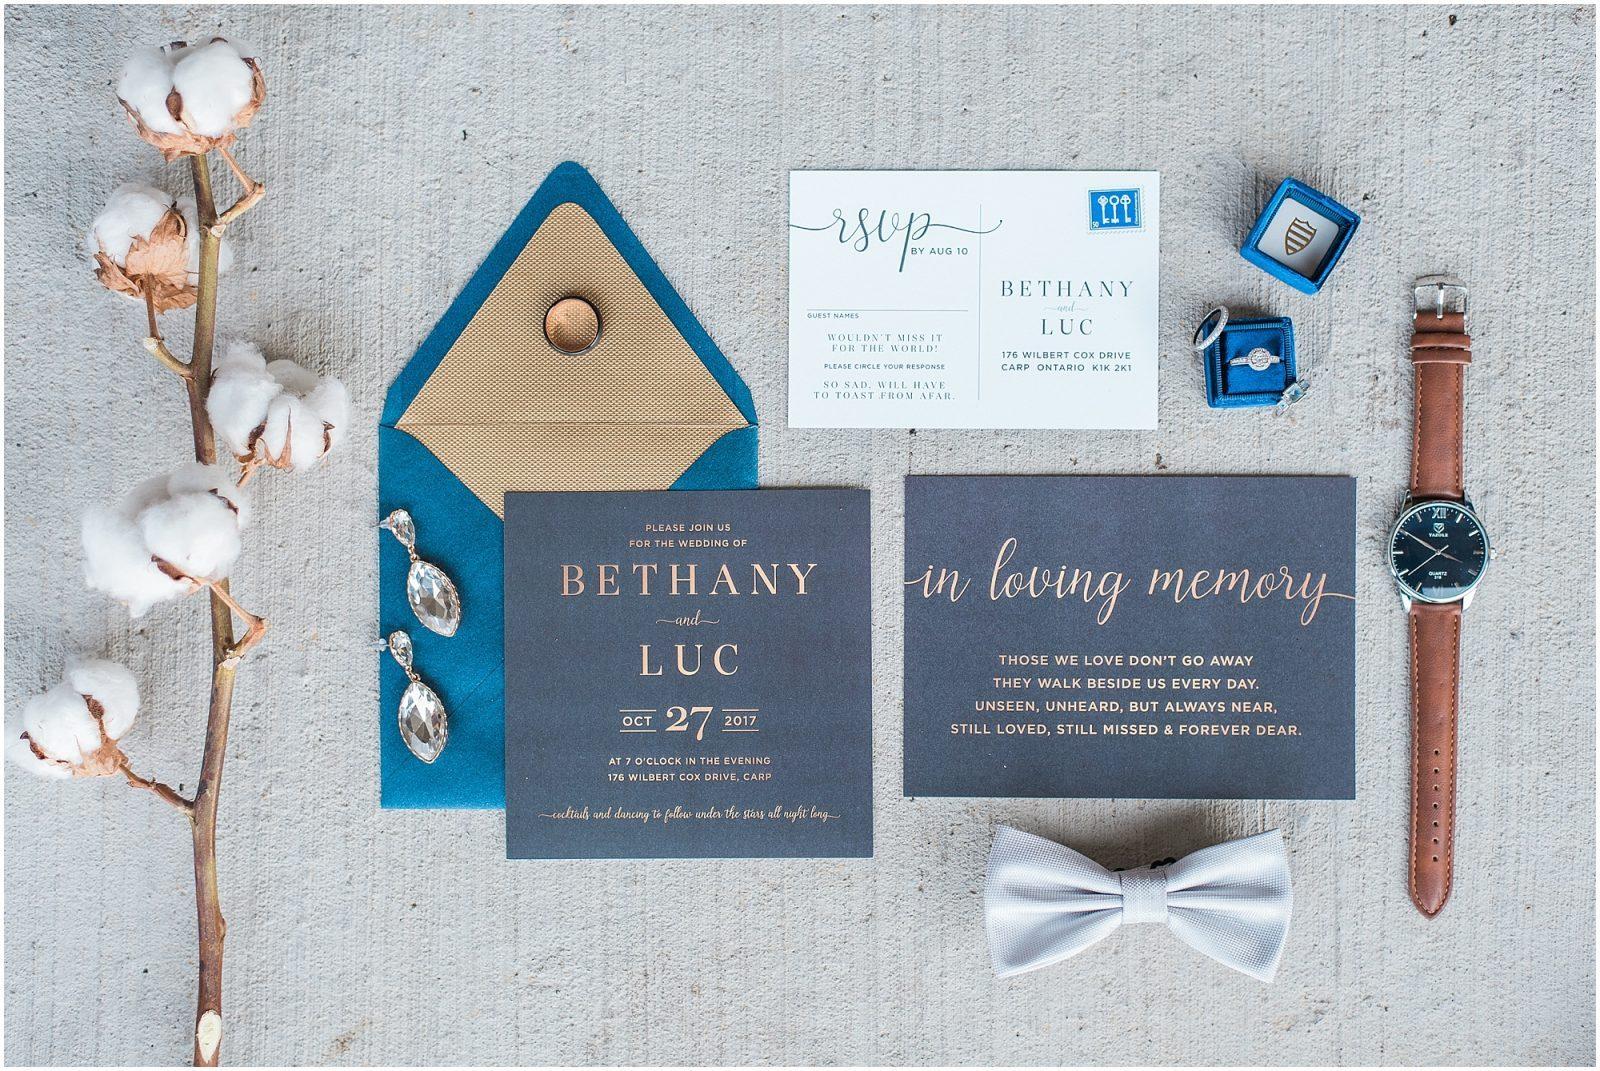 0003 Bethany and Luc - Fall Backyard Ottawa Wedding - Copper and Navy - PhotosbyEmmaH.jpg